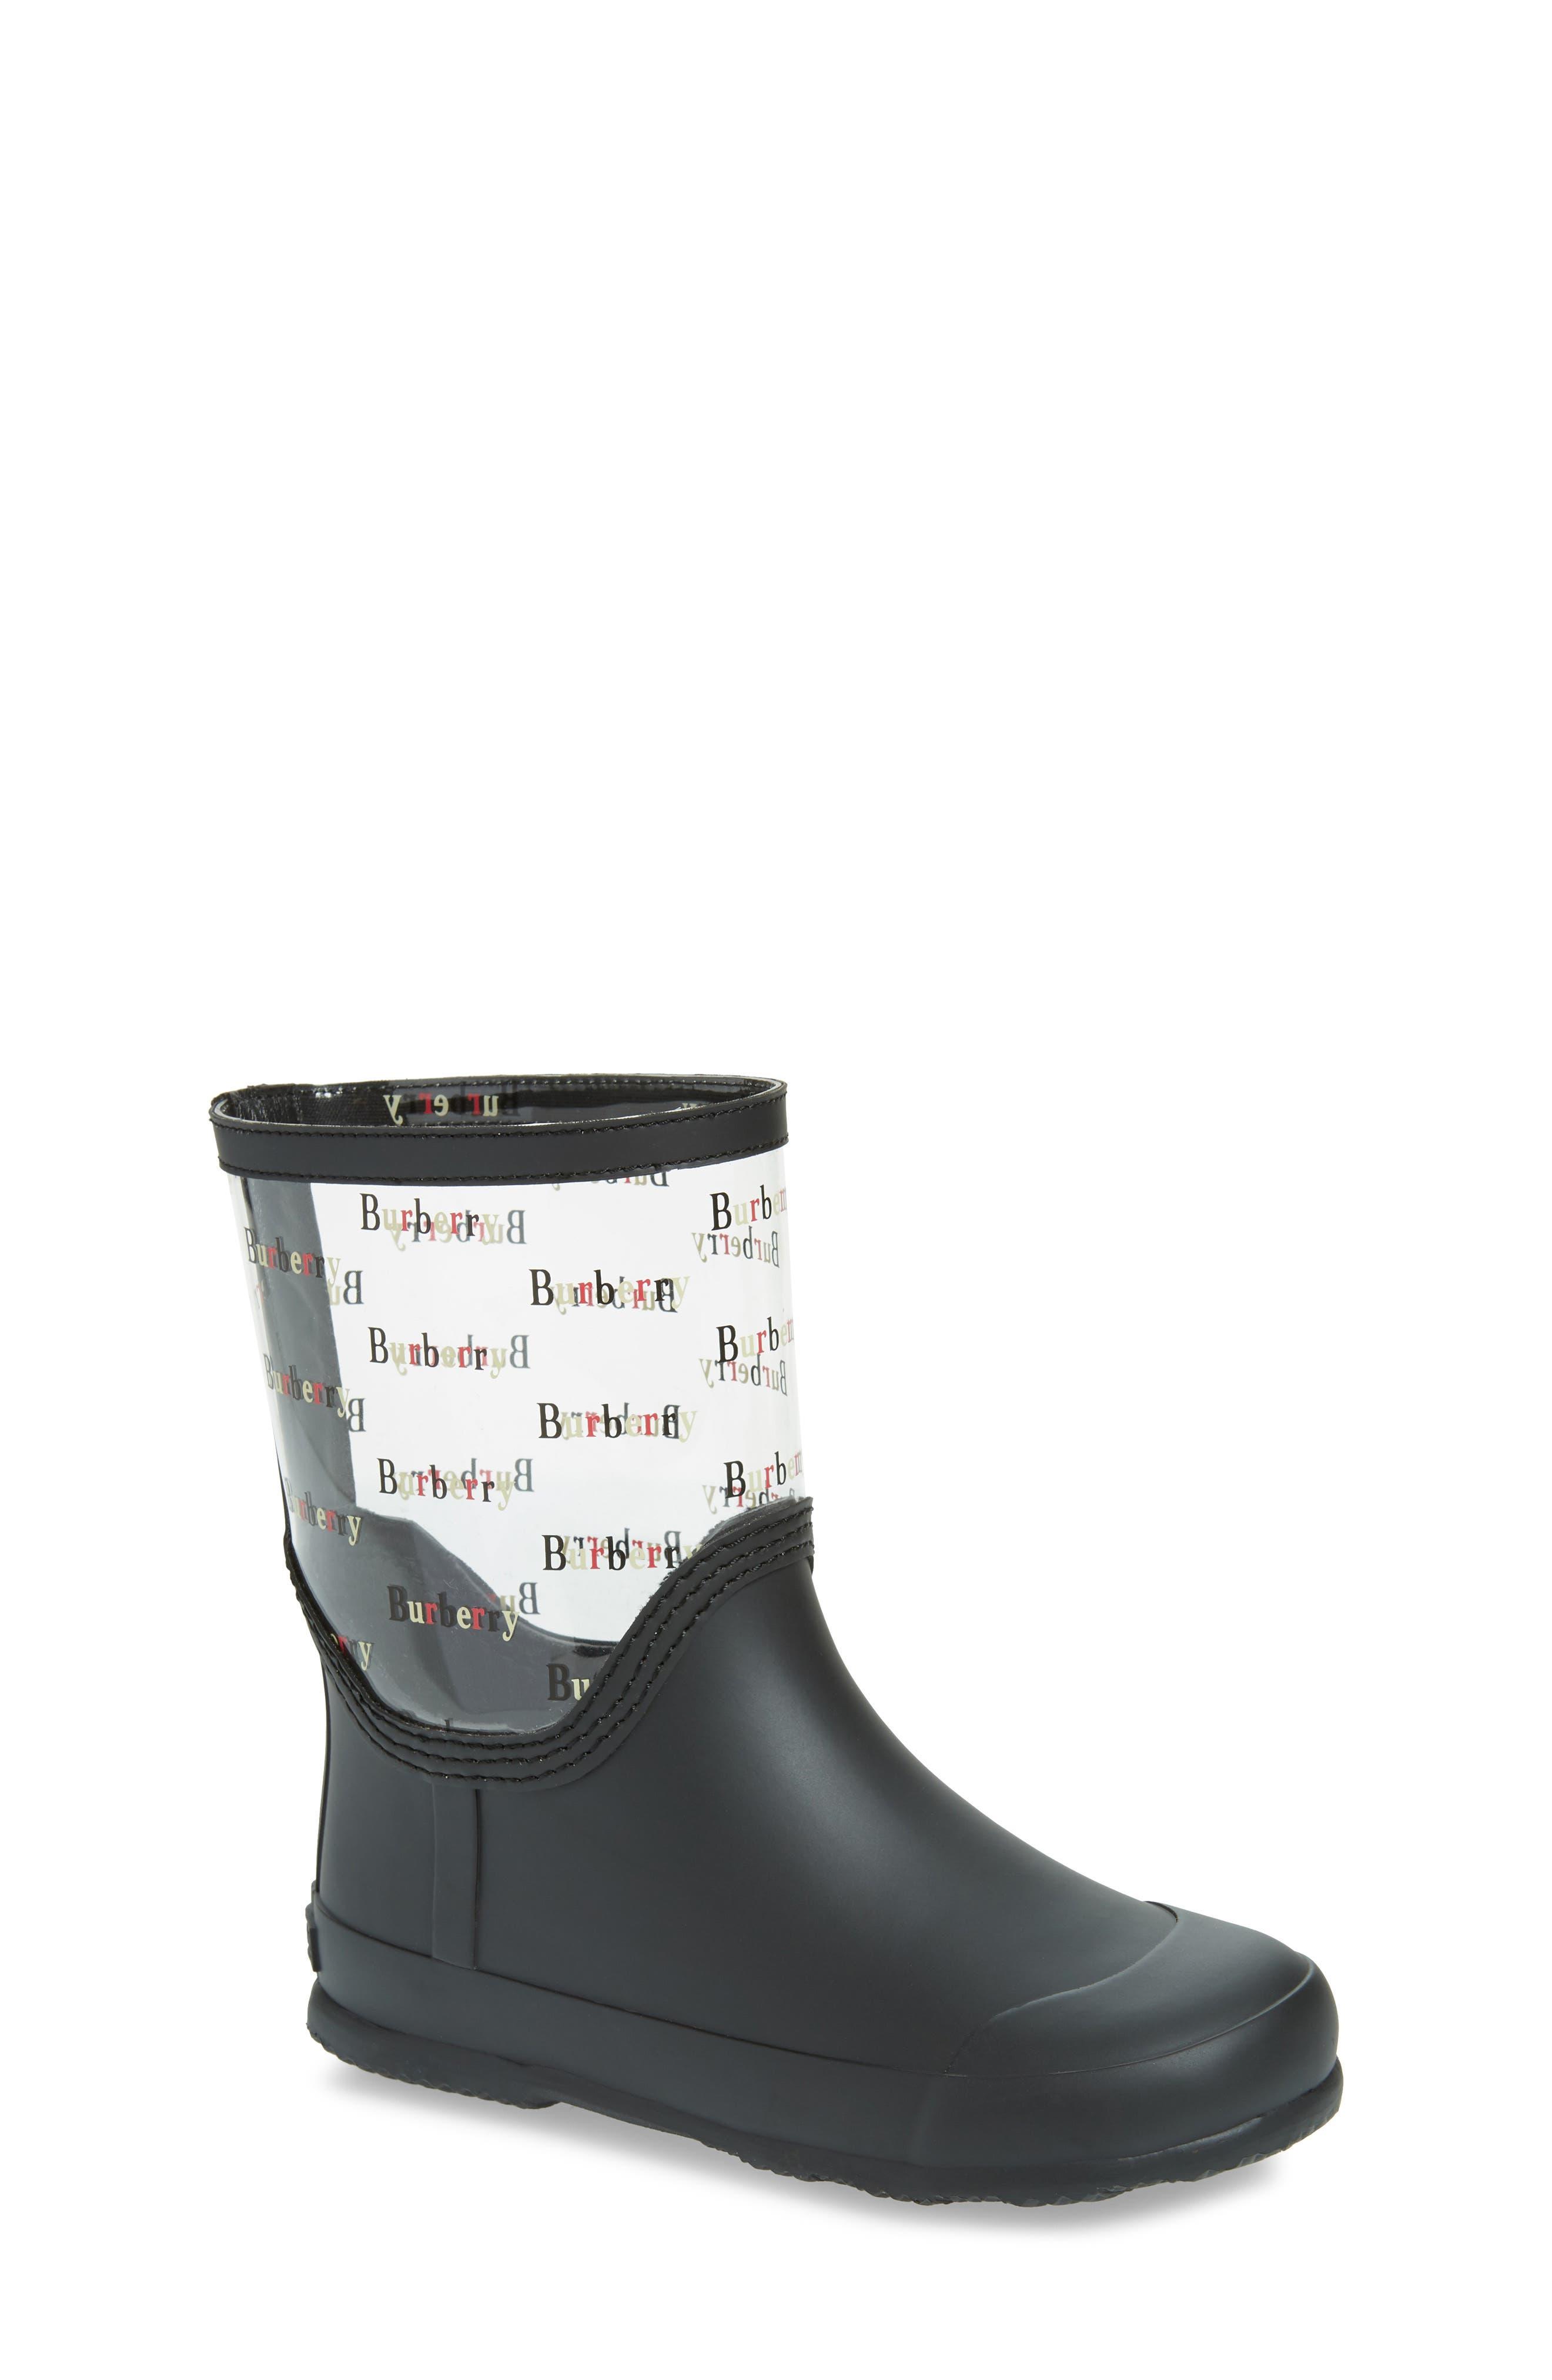 BURBERRY Frosty Waterproof Rain Boot, Main, color, BLACK